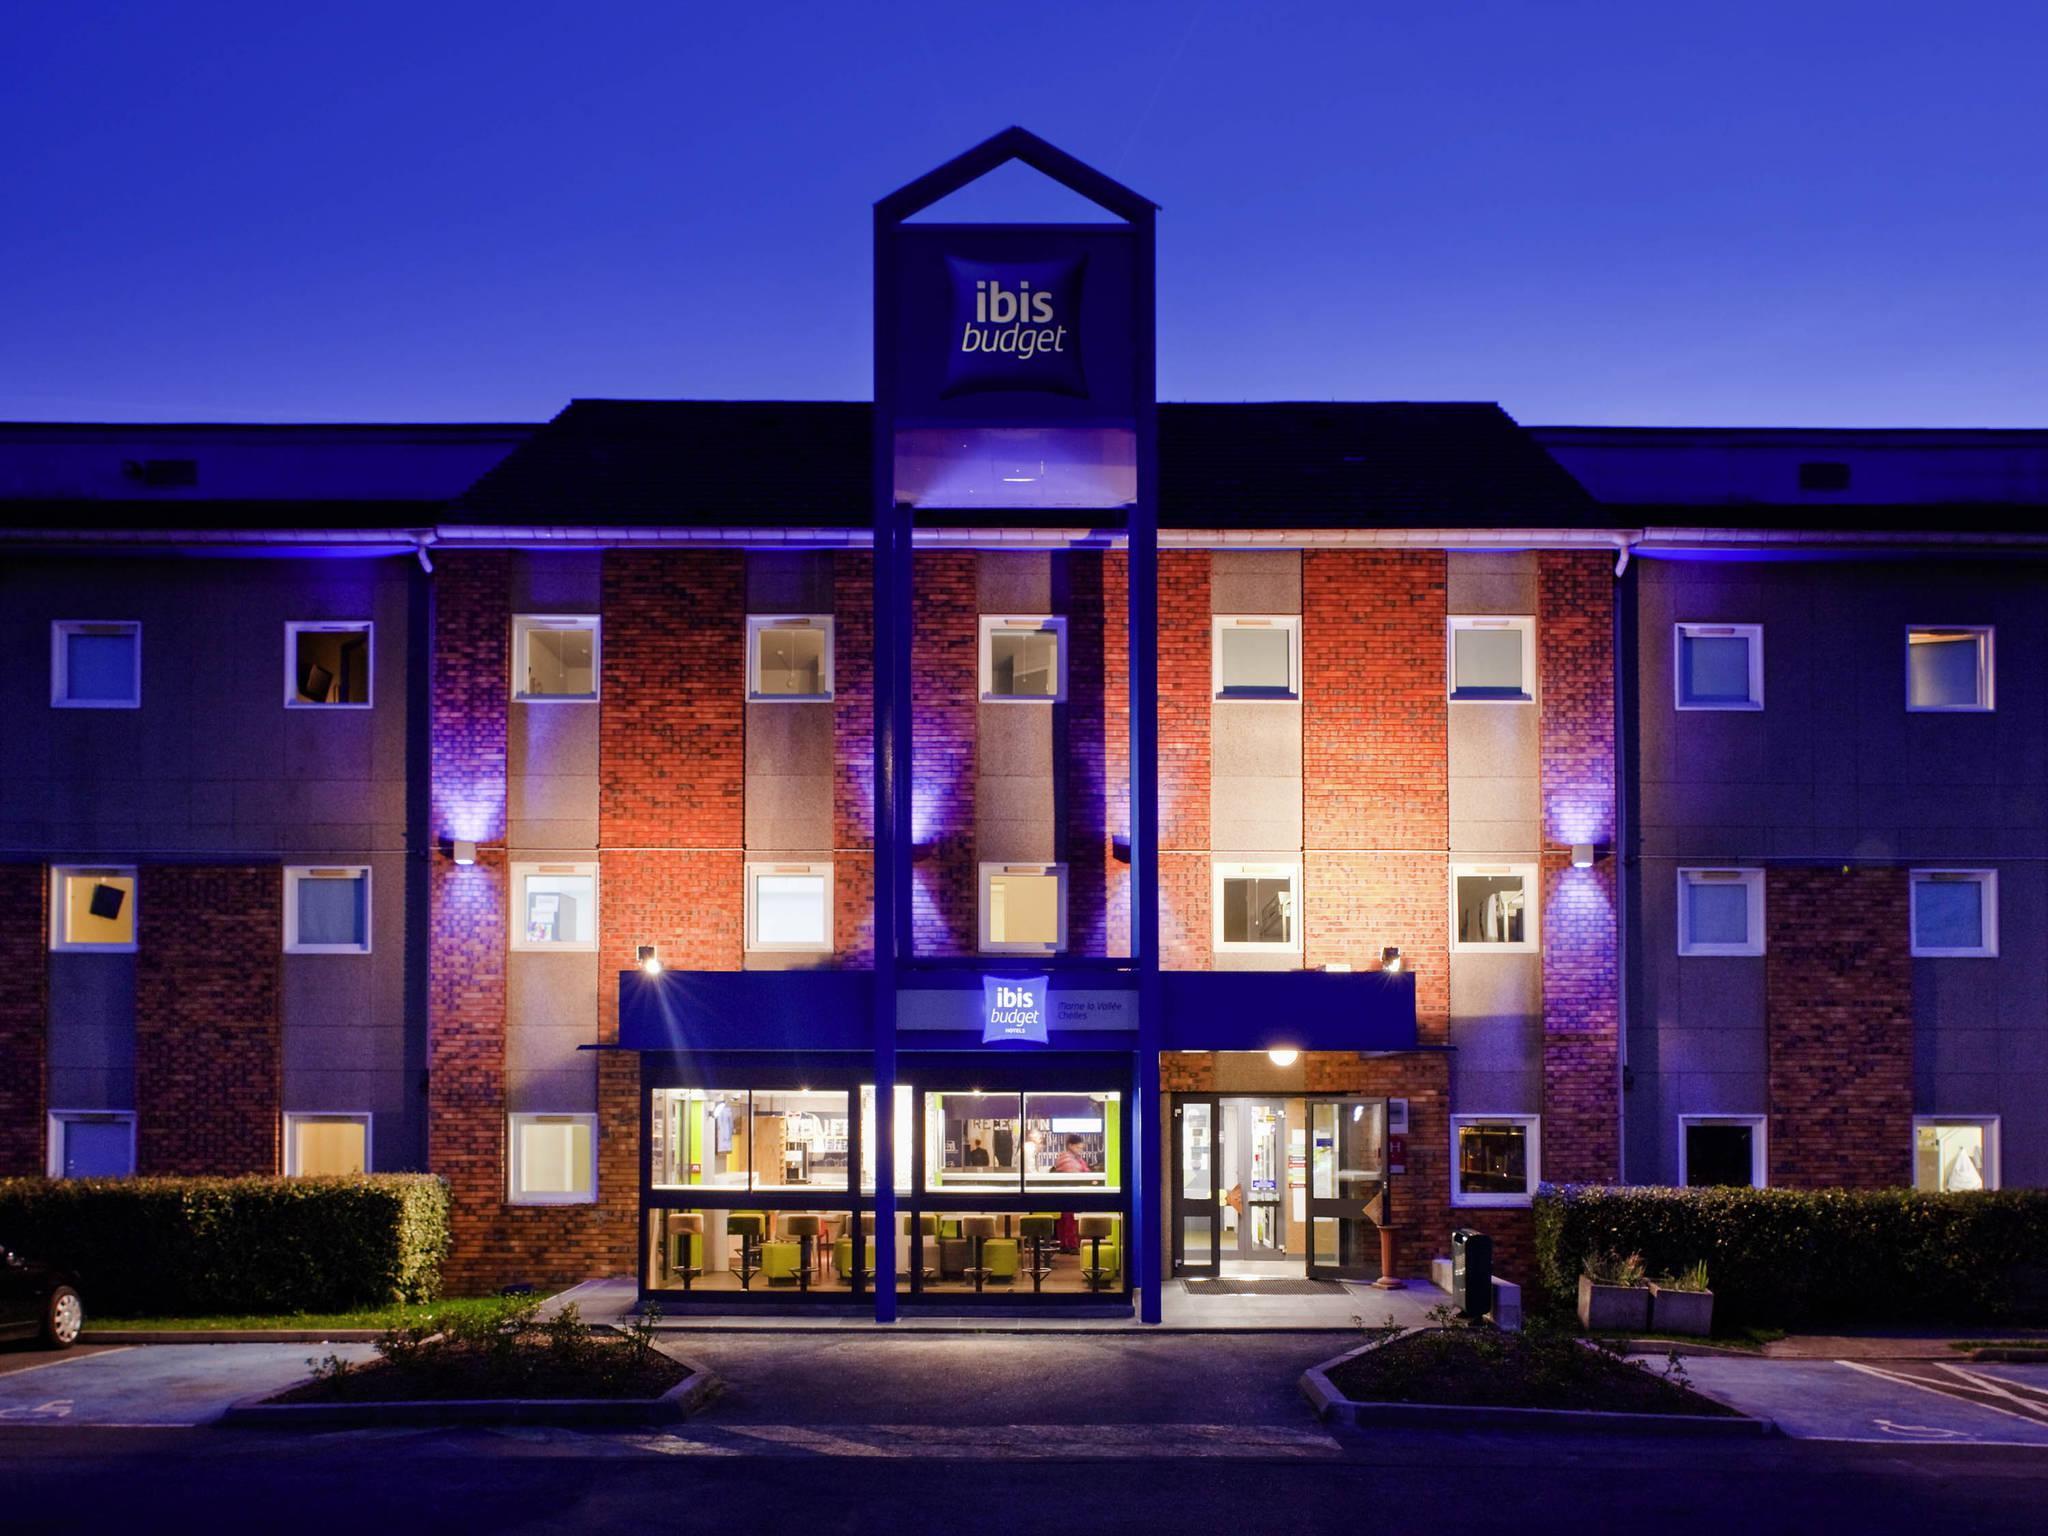 Hotell – ibis budget Marne-la-Vallée Chelles